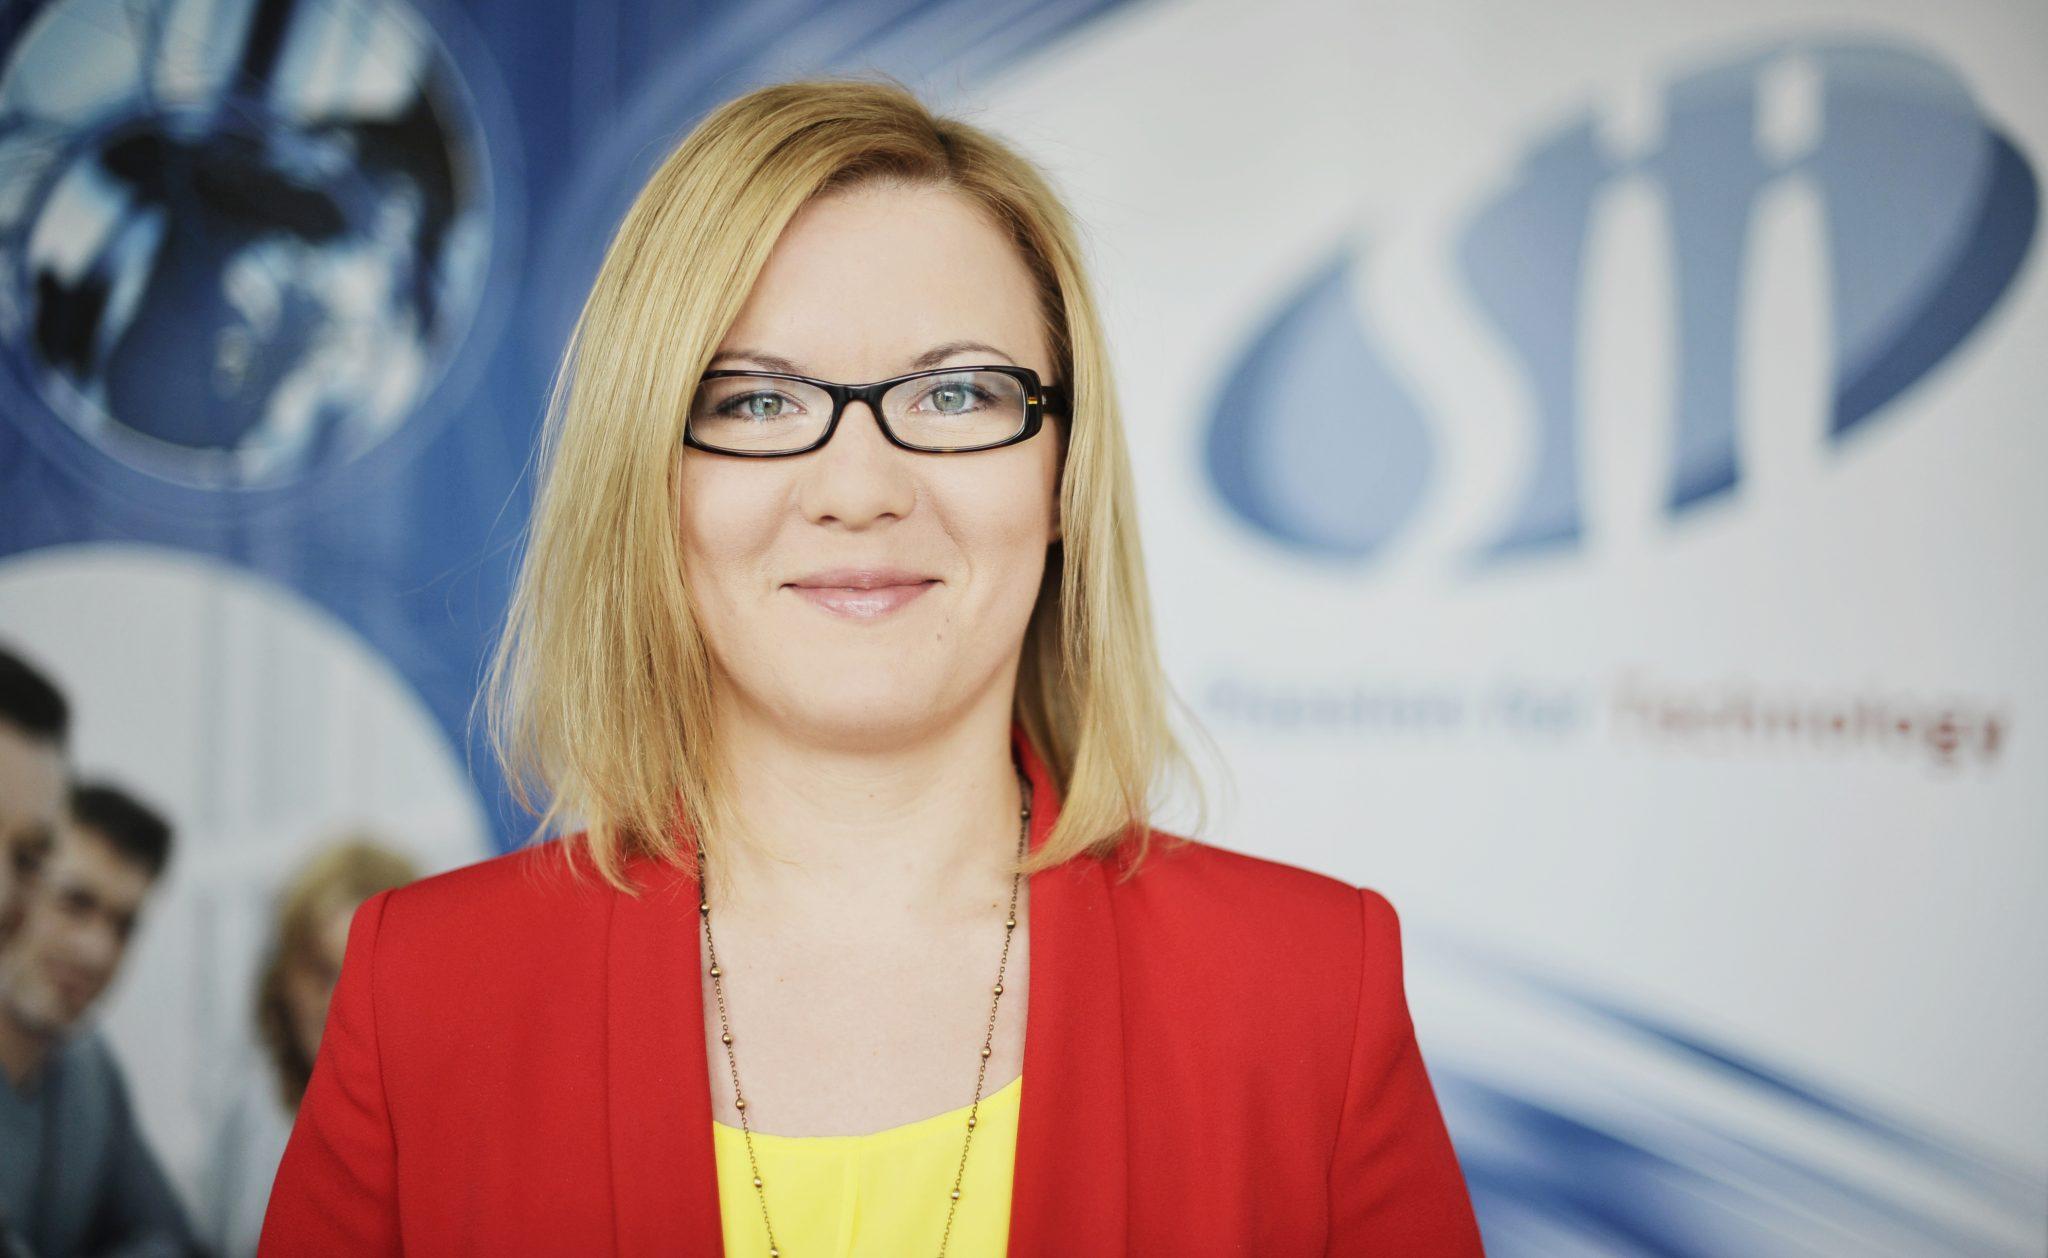 Joanna Kucharska